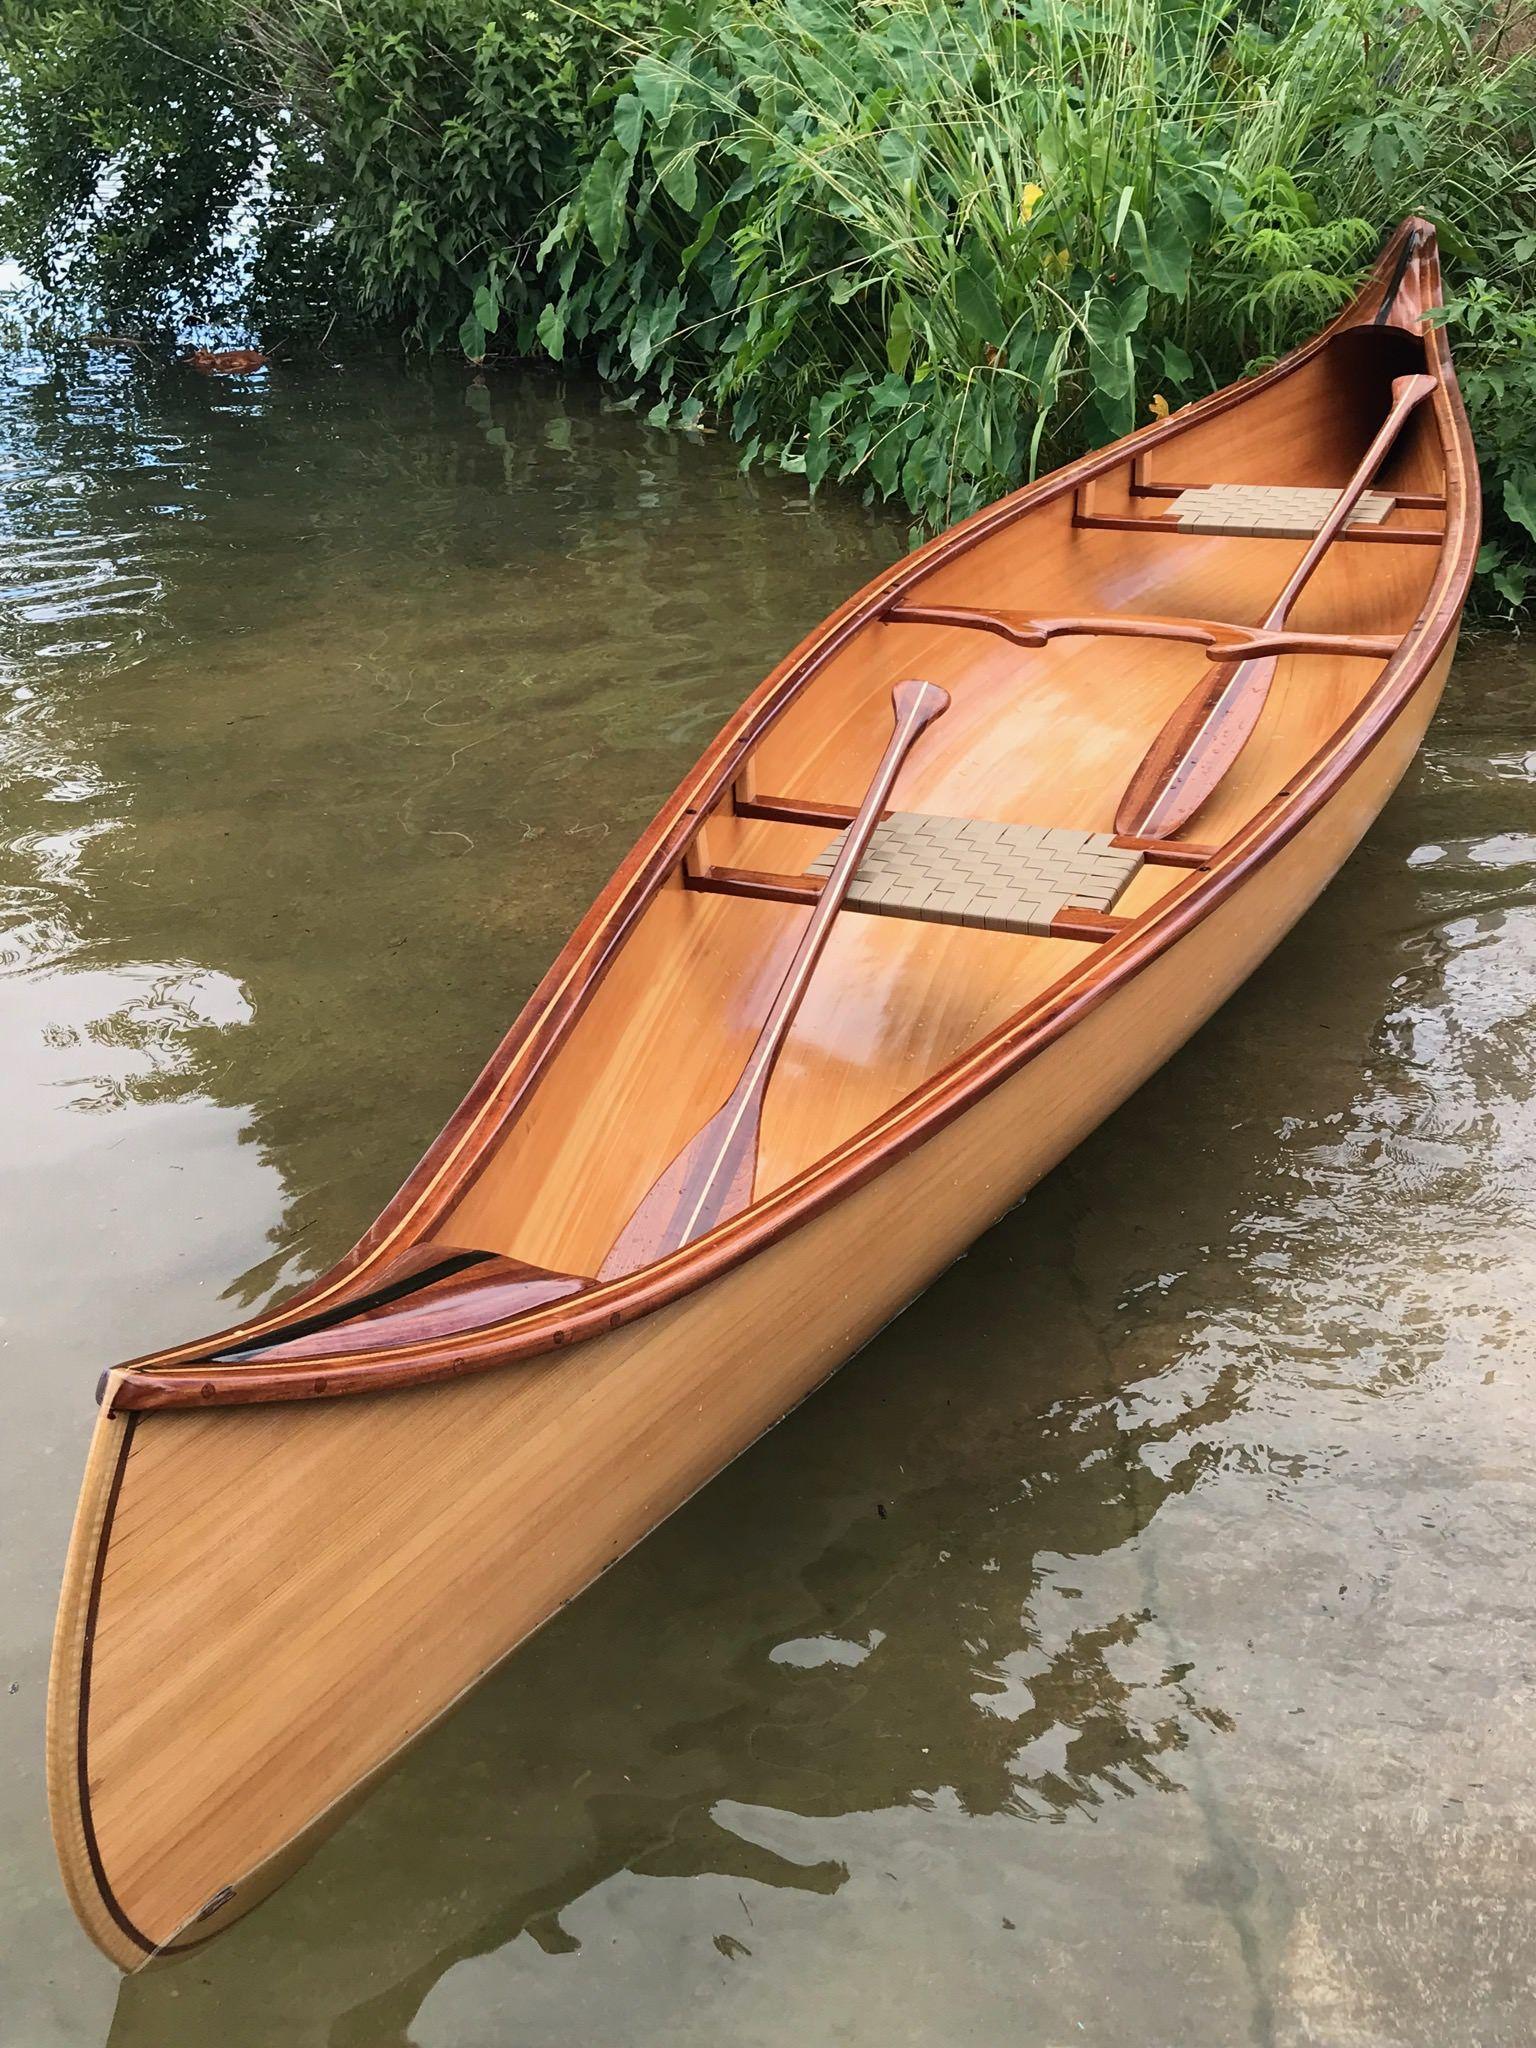 Douglas Fir And Mahogany Canoe 15 Hiawatha Handmade Crafts